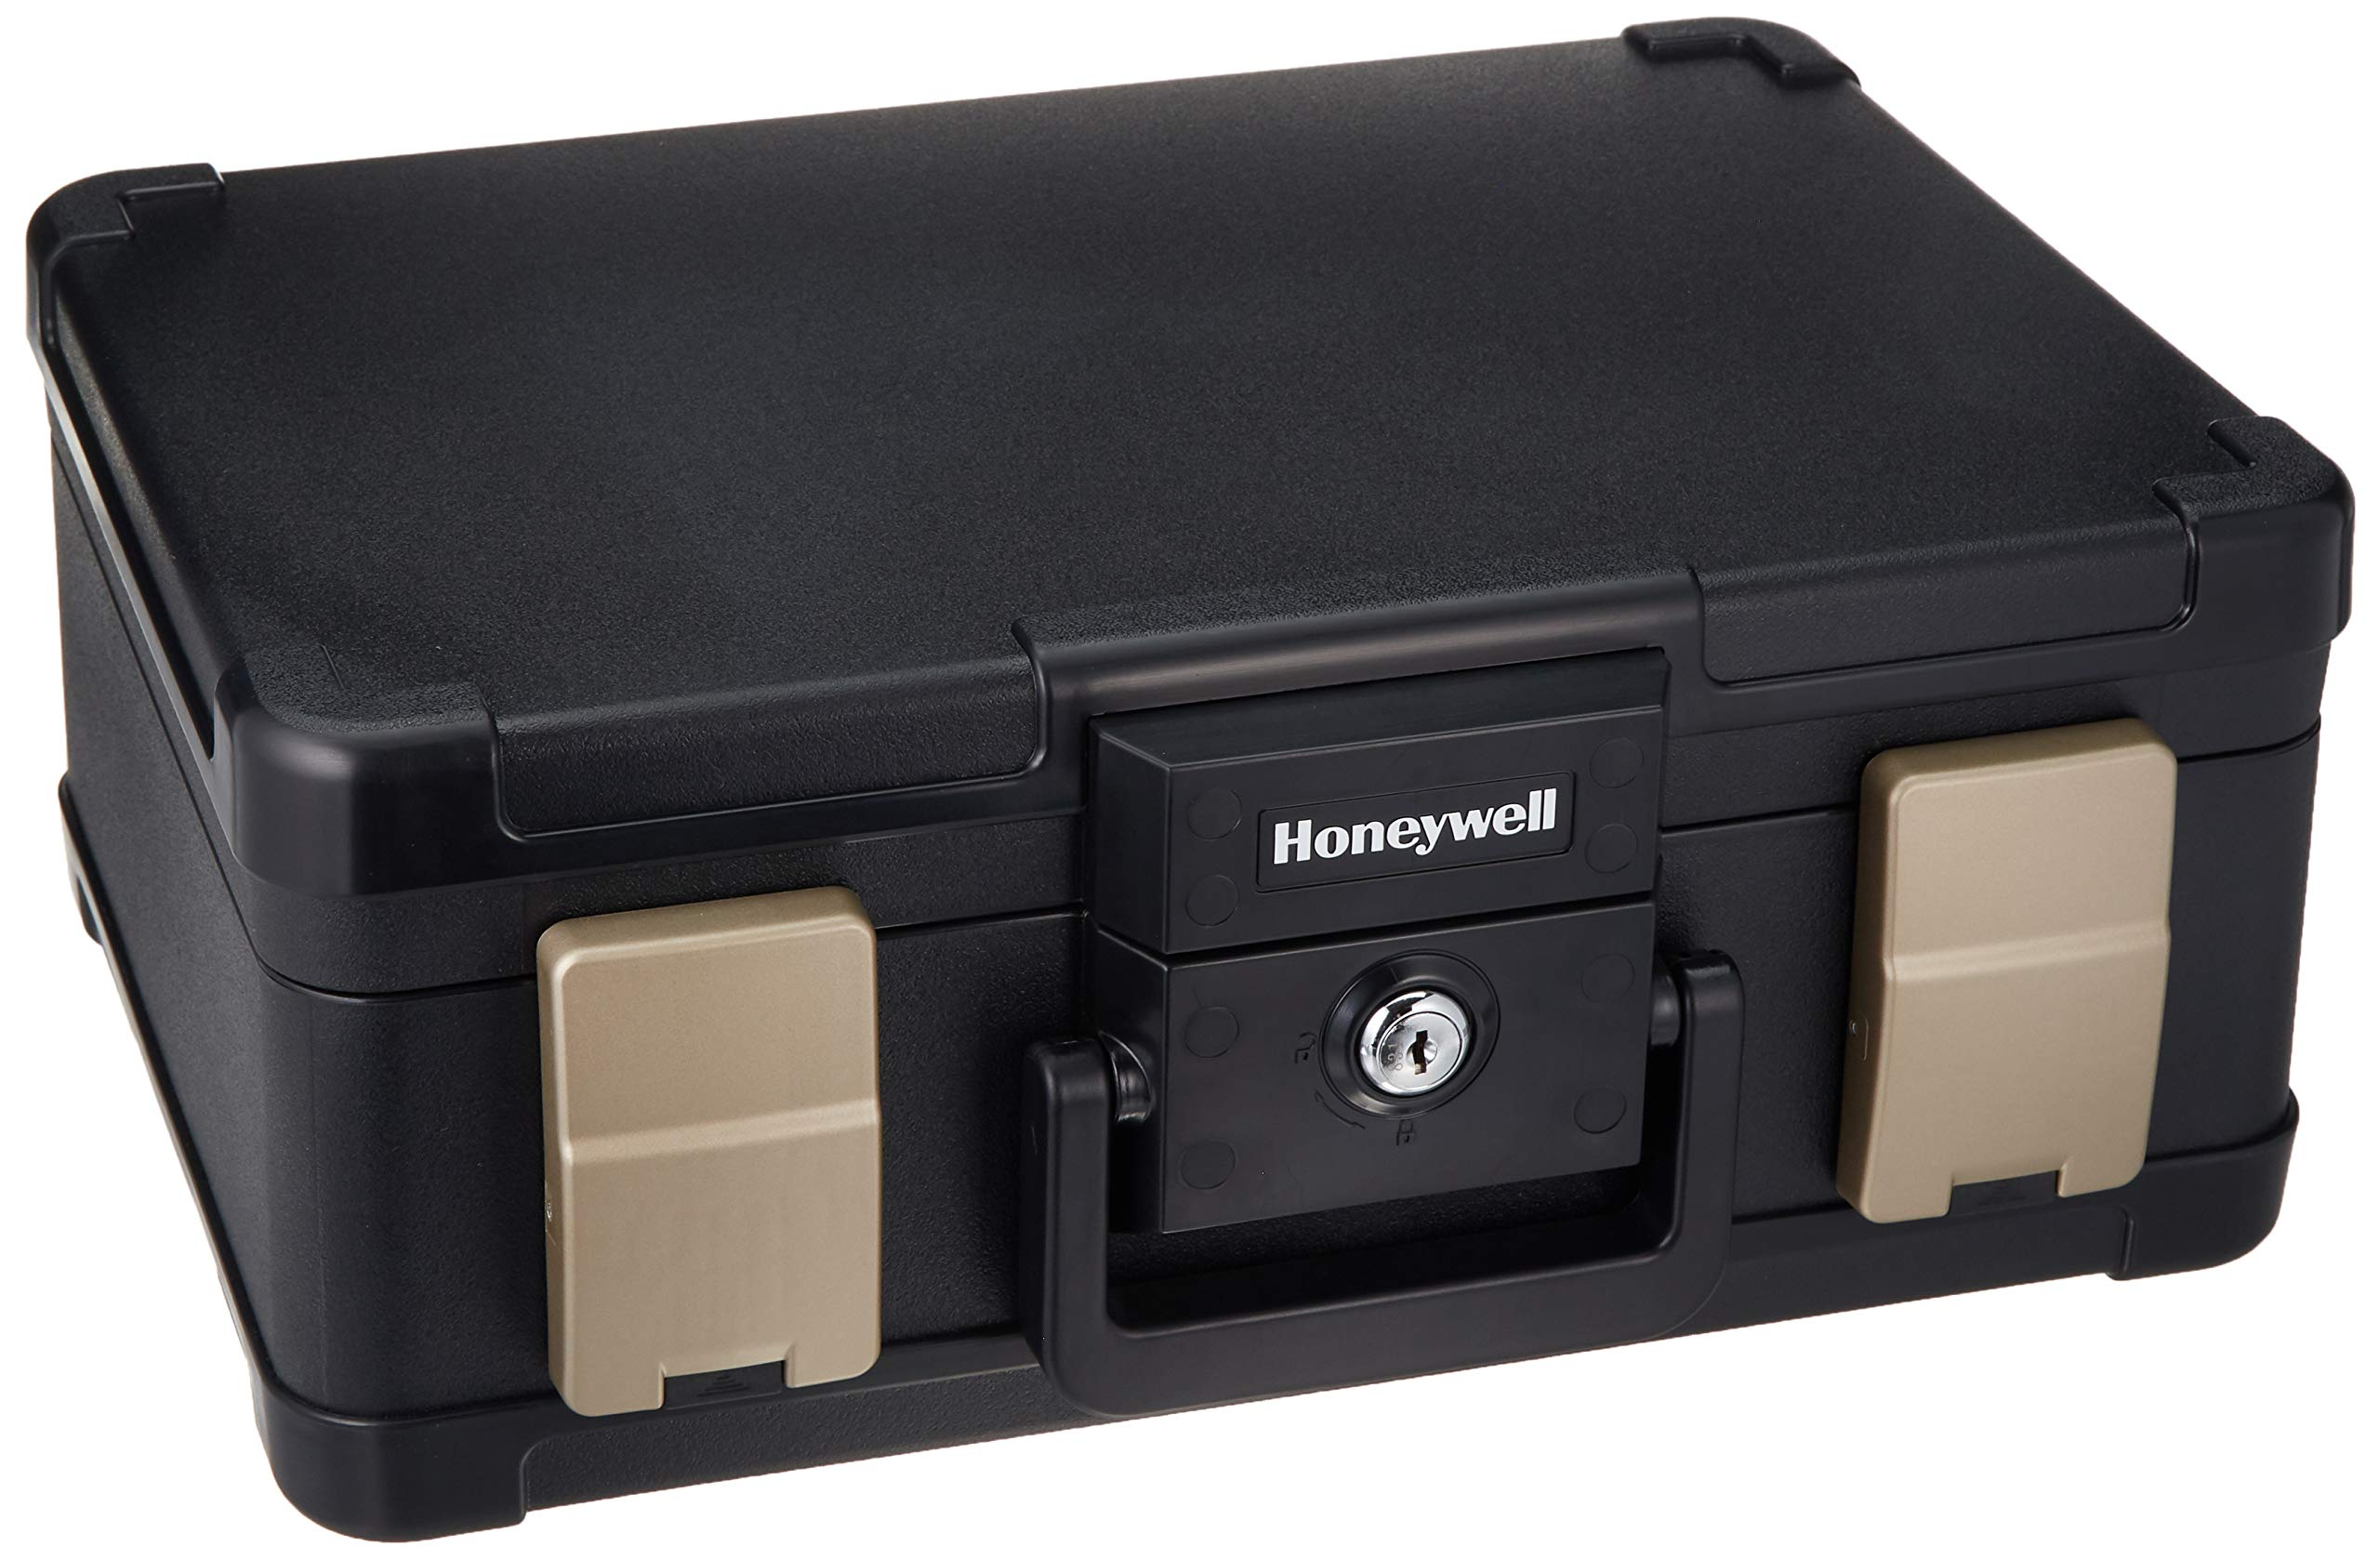 Honeywell Safes & Door Locks - 30 Minute Fire Safe Waterproof Safe Box Chest with Carry Handle, Medium, 1103 by Honeywell Safes & Door Locks